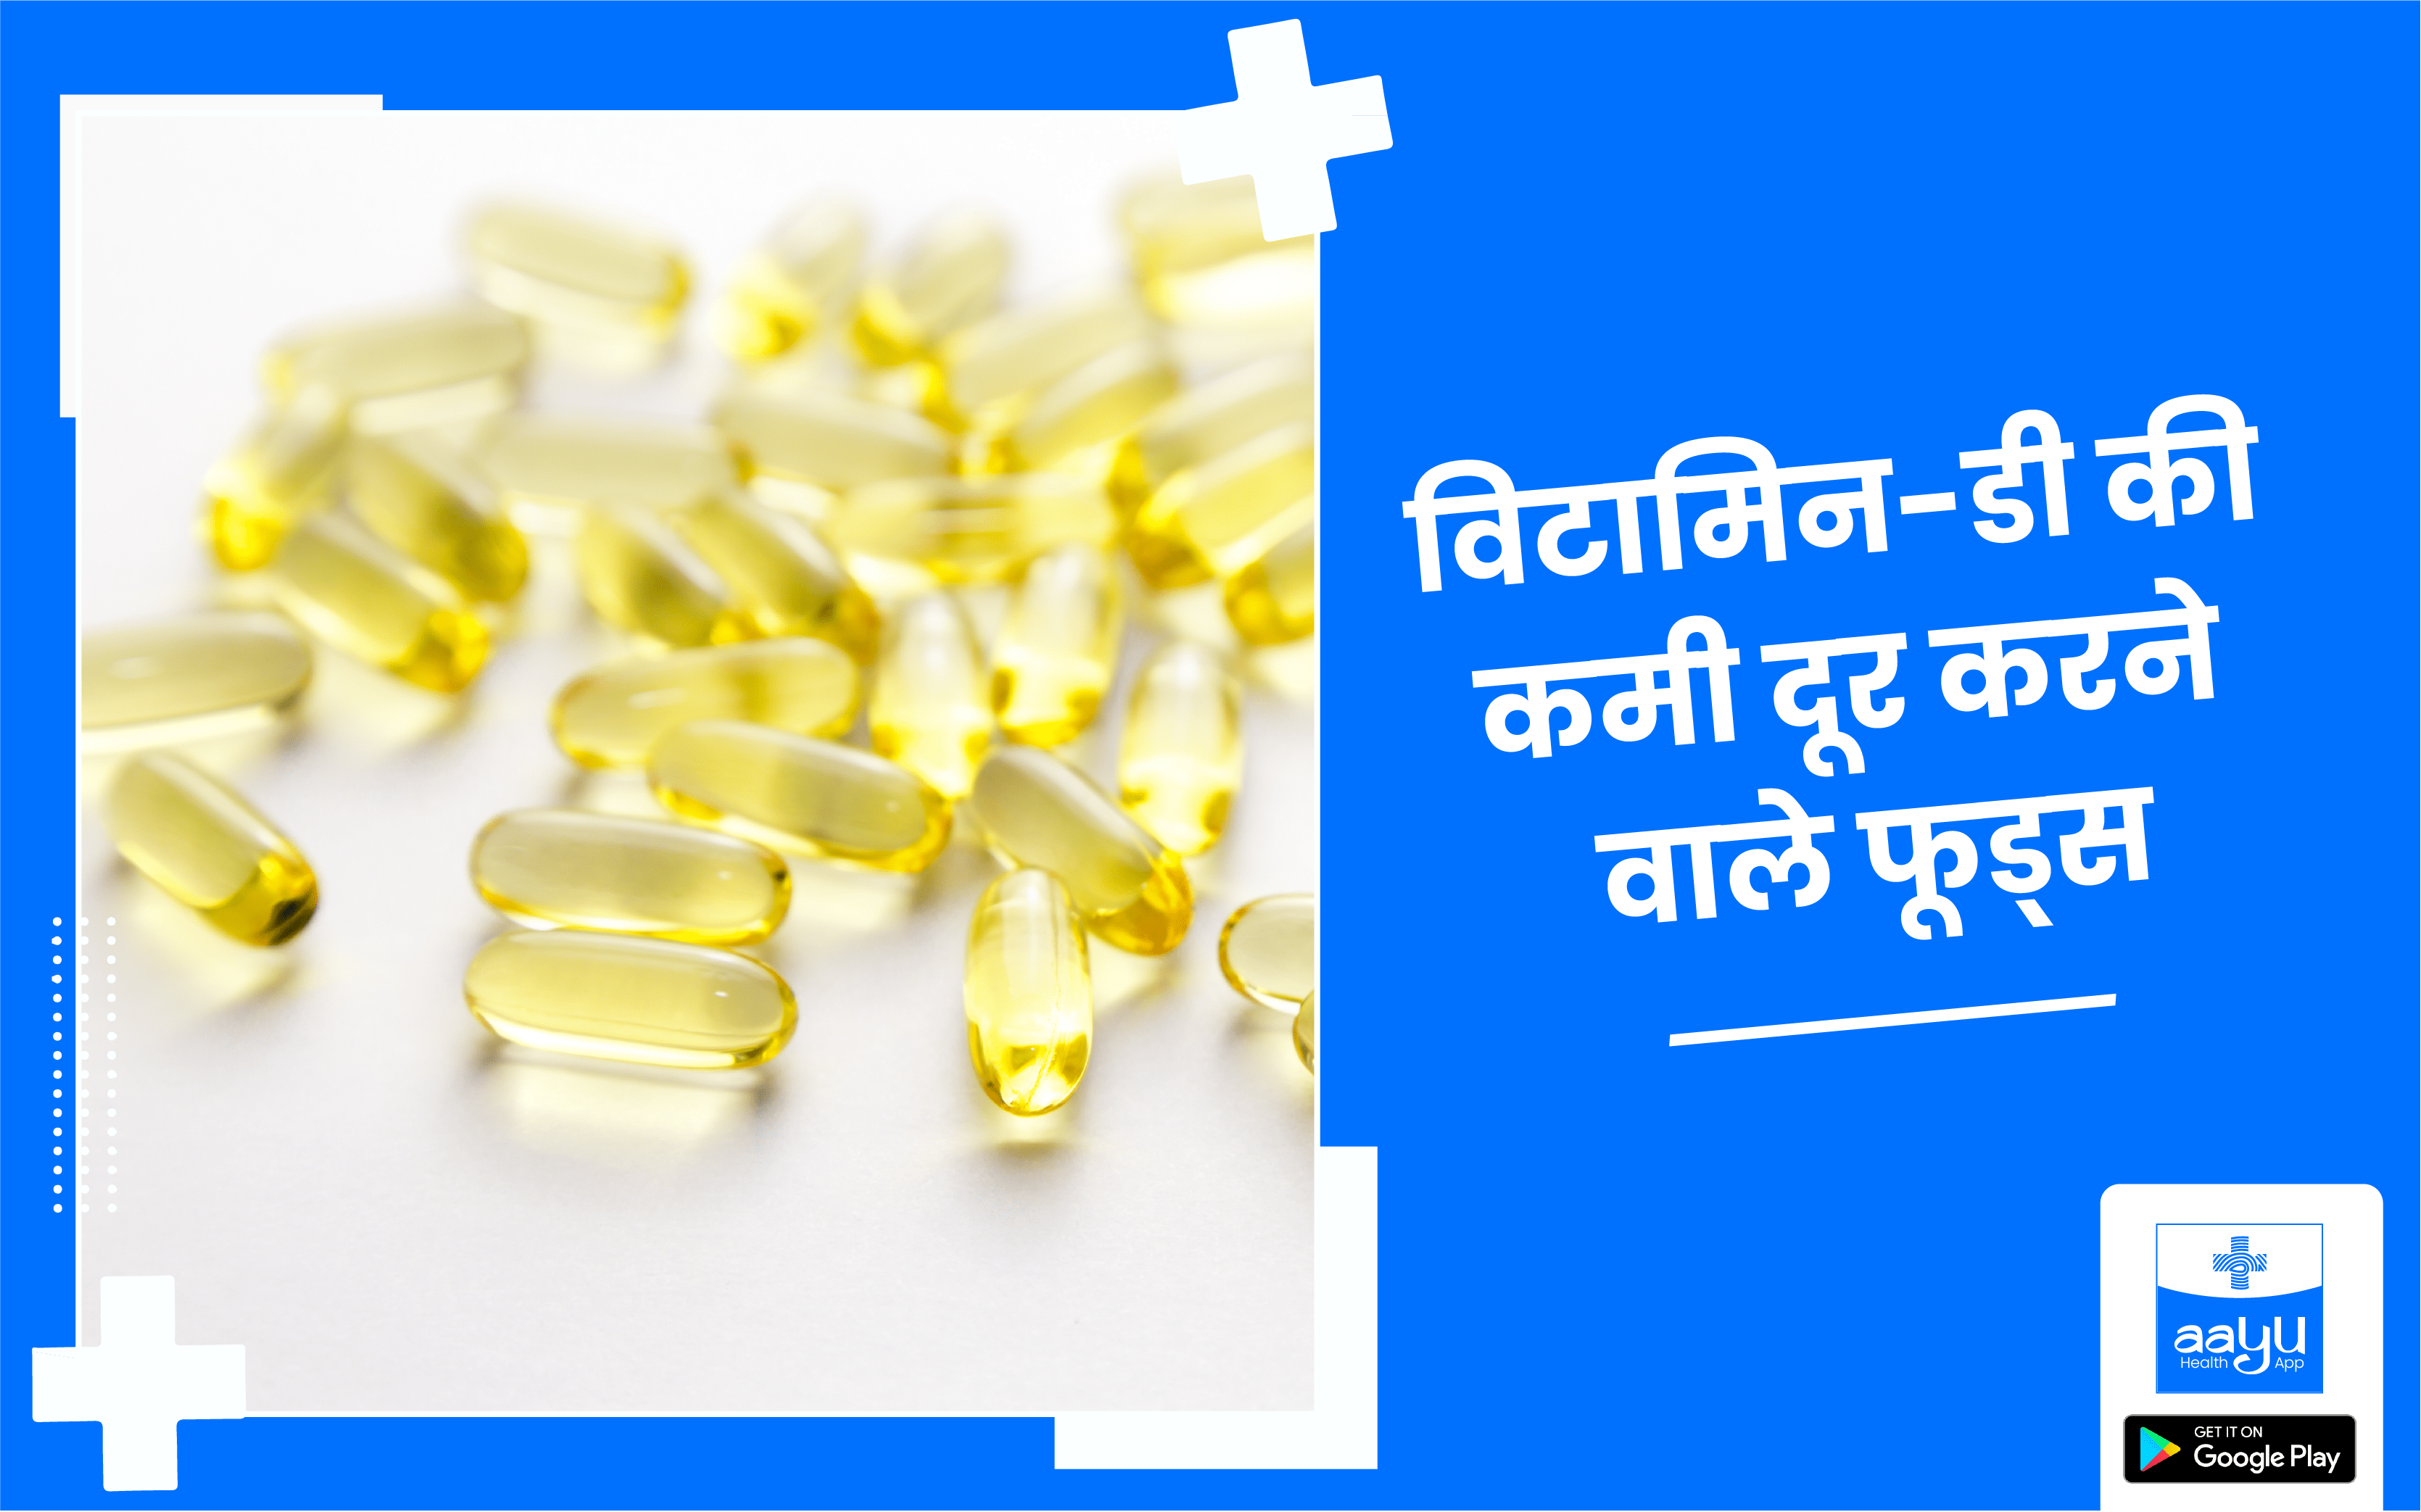 विटामिन-डी की कमी दूर करने वाले फूड्स | Foods to Overcome Vitamin-D deficiency in Hindi: